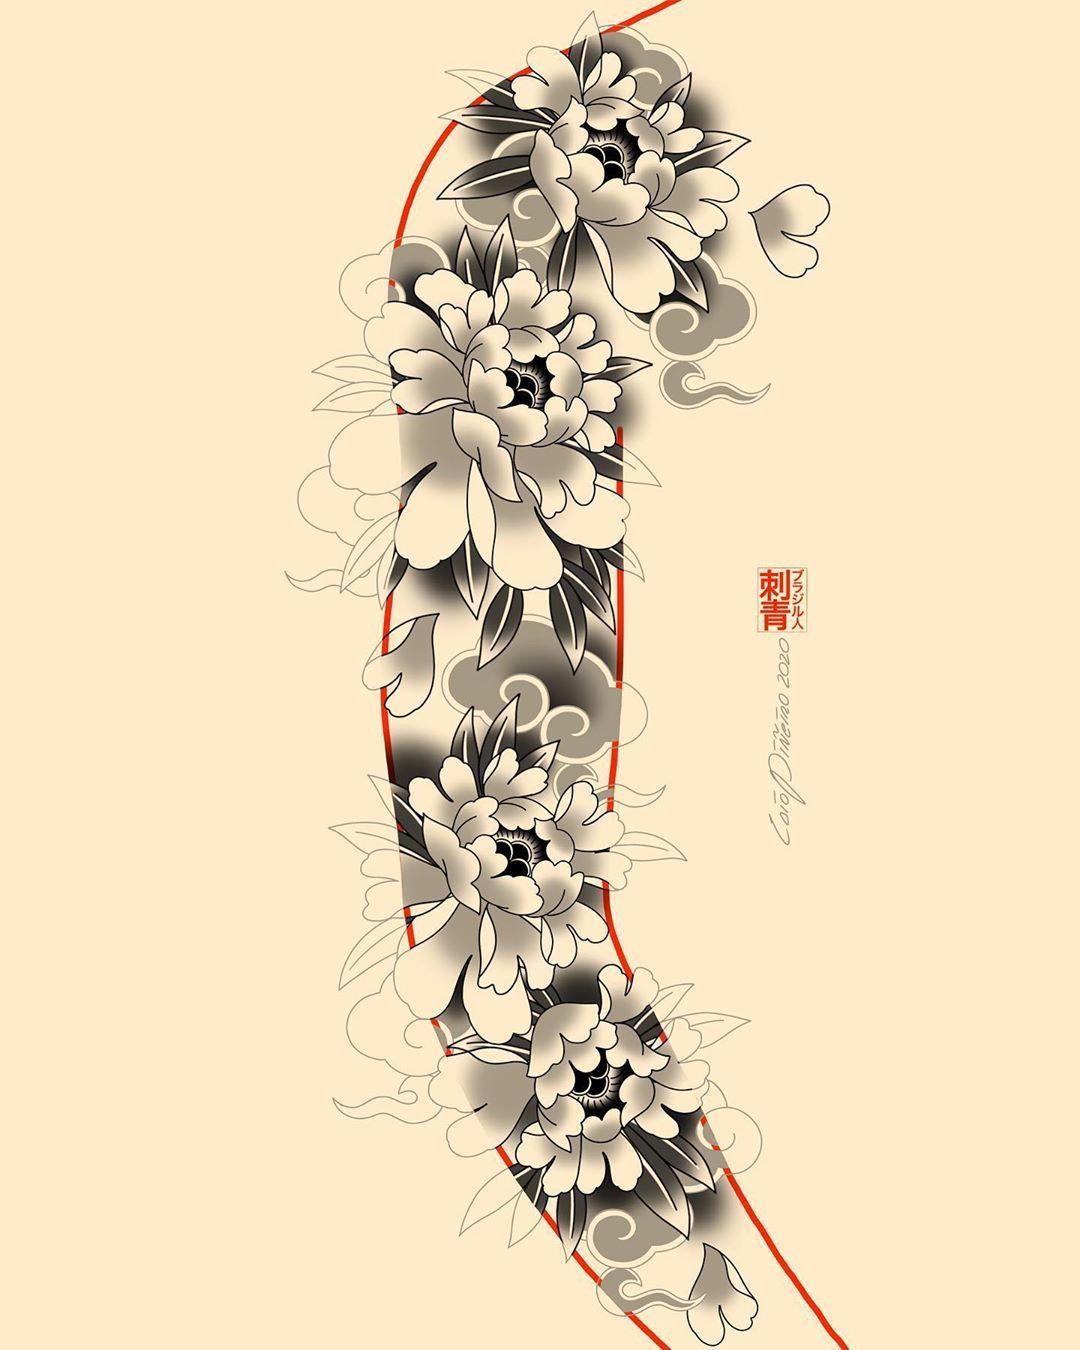 "Photo of 彫海 • HORIKAI • CAIO PIÑEIRO on Instagram: ""#peony #botan • You can find me @kokorotattoolondon🇬🇧 & @kokorotattoosp🇧🇷 • Bookings 📧caiopineiro@hotmail.com  #彫海 #刺青 #irezumi #horimono…"""